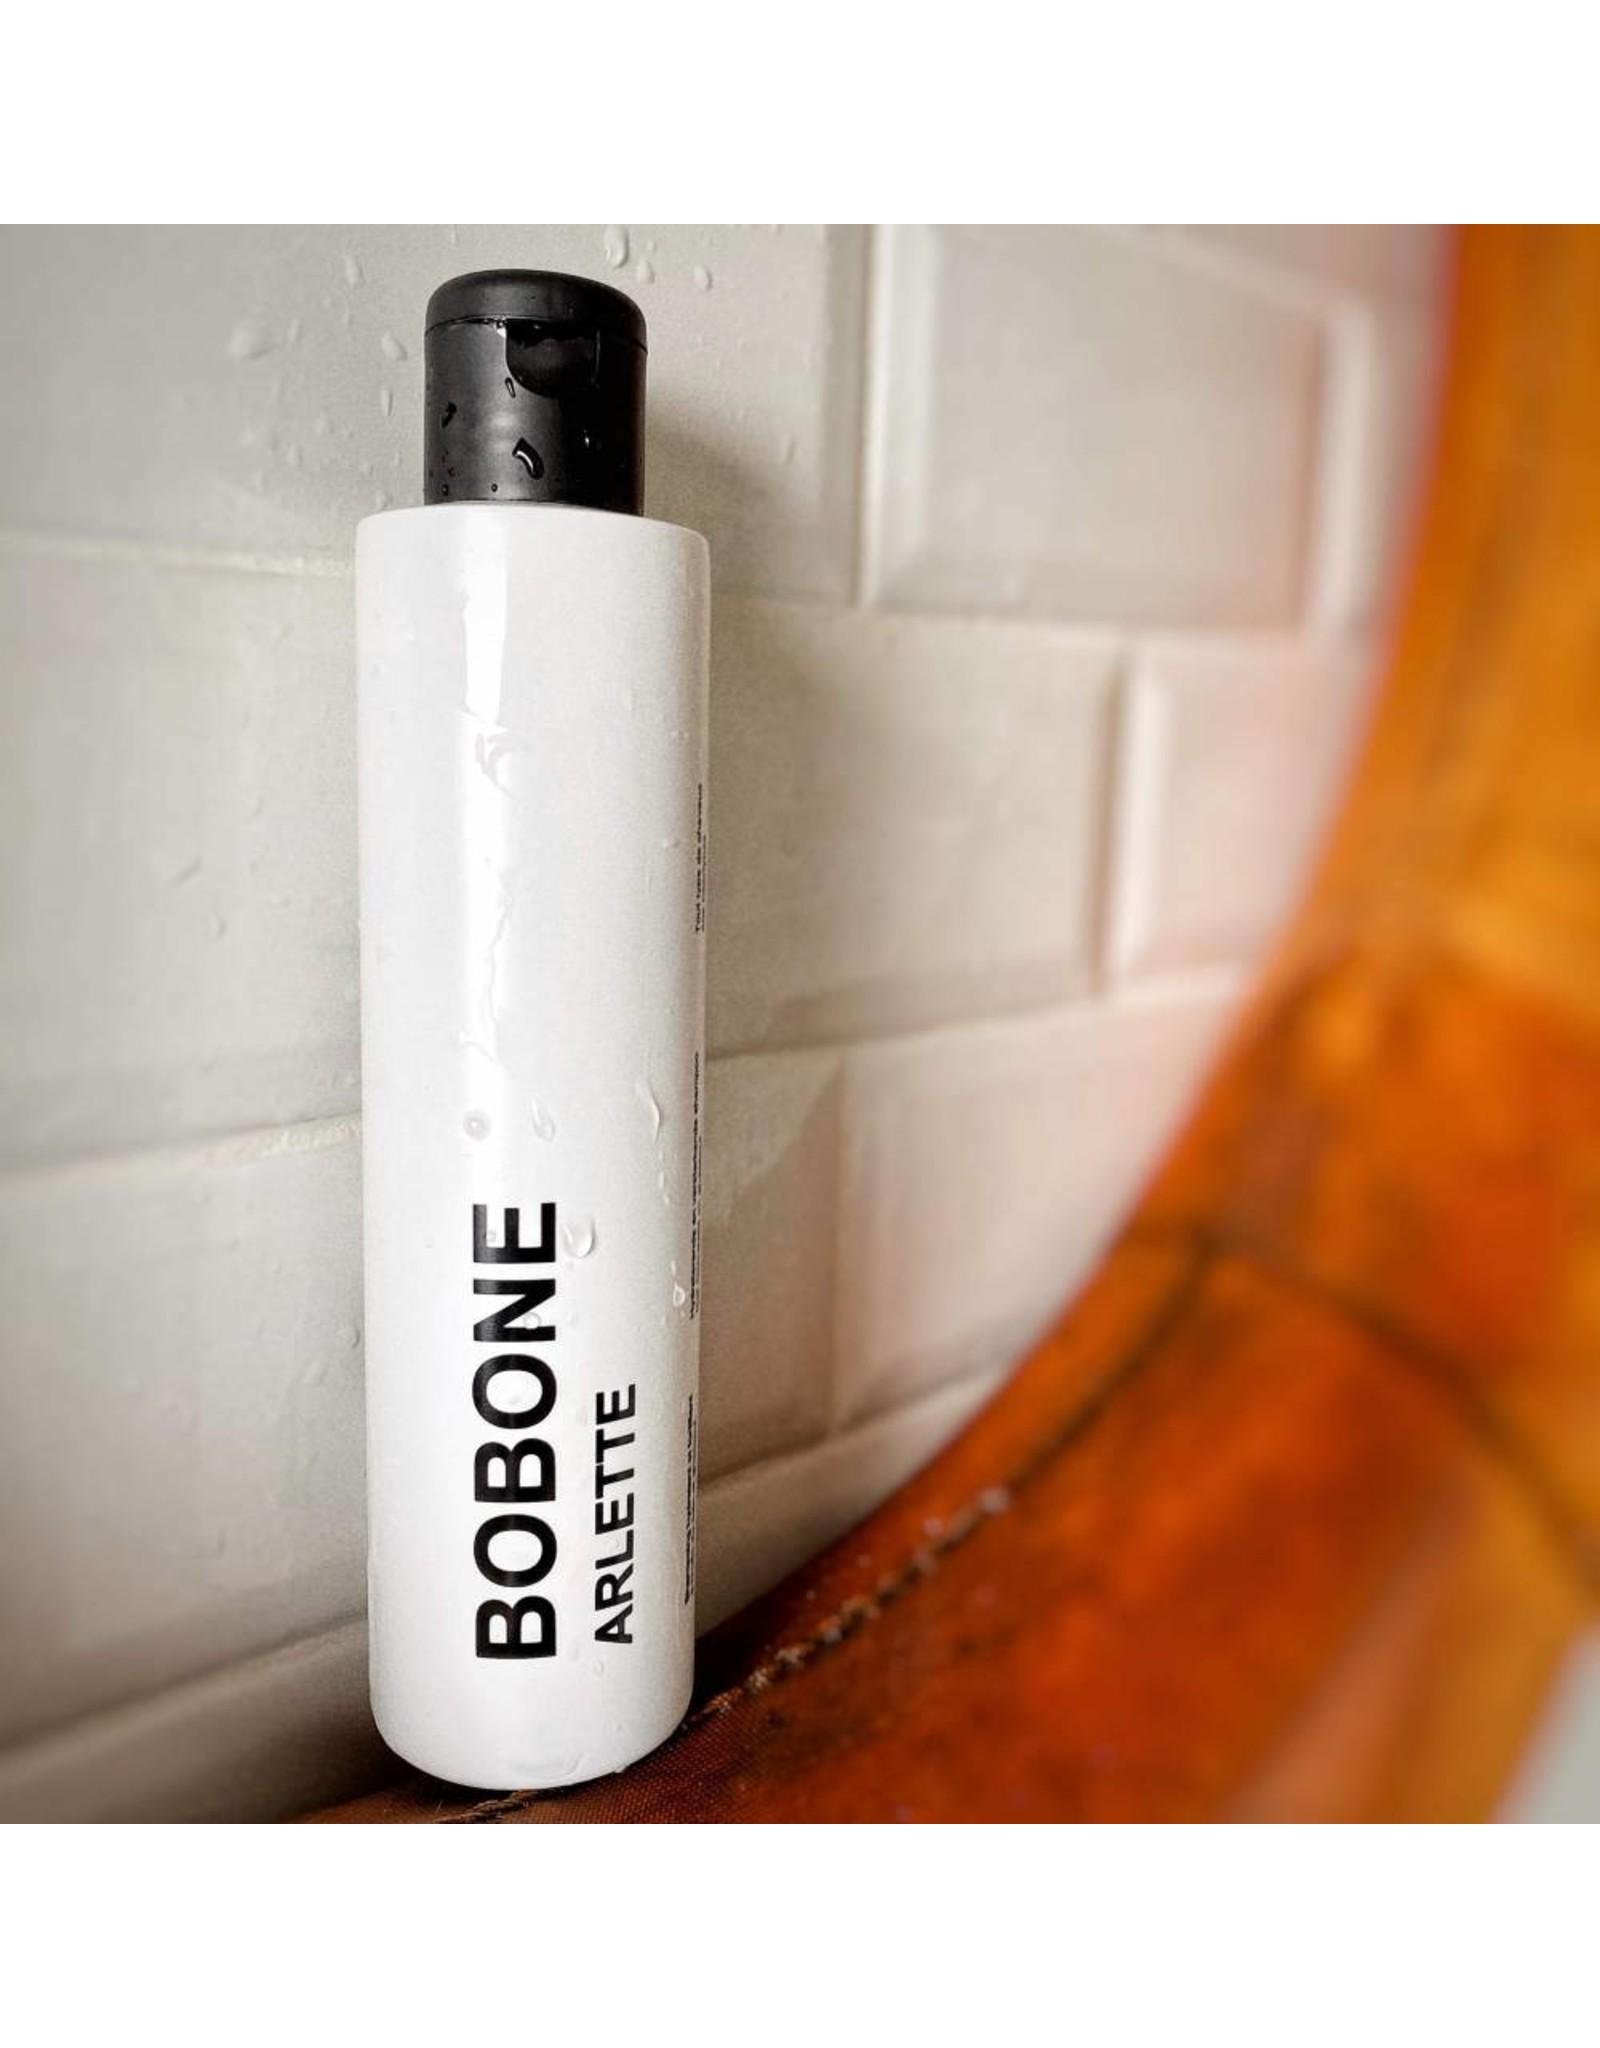 BOBONE Shampoing ARLETTE 185ml